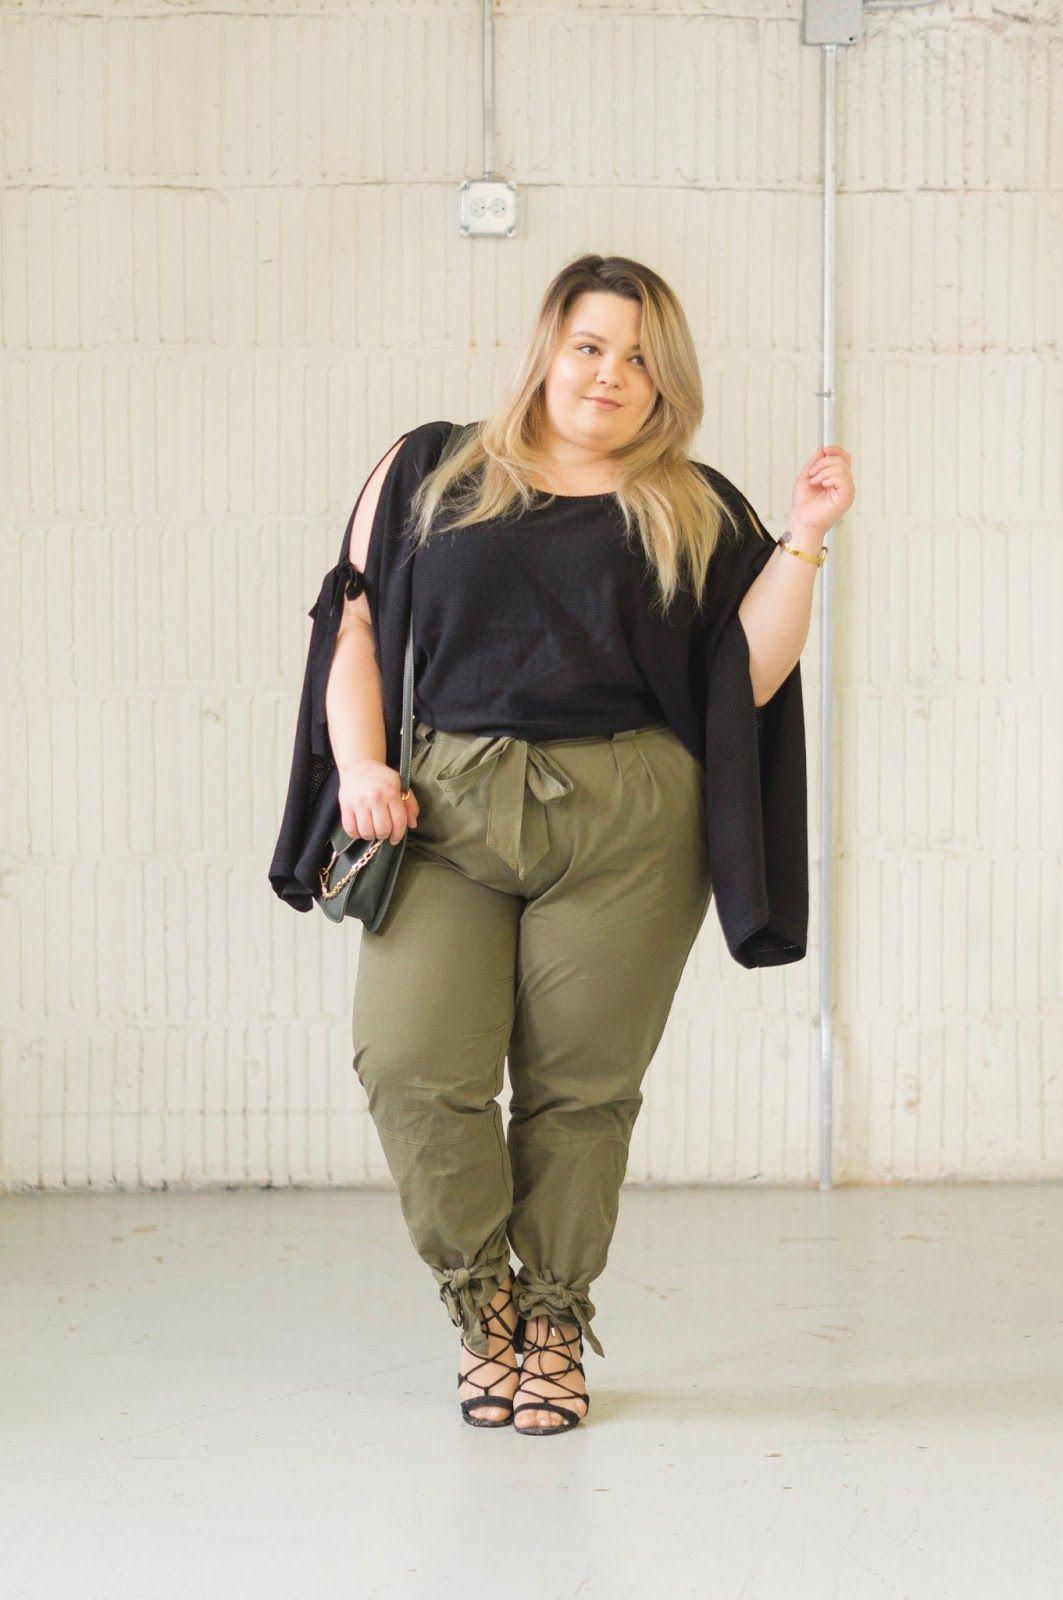 Chicago Plus Size Fashion Blogger Natalie Craig Reviews Fashion Nova Curve S Going On An Advent Plus Size Fashion Blog Plus Size Fashion Fashion Nova Plus Size